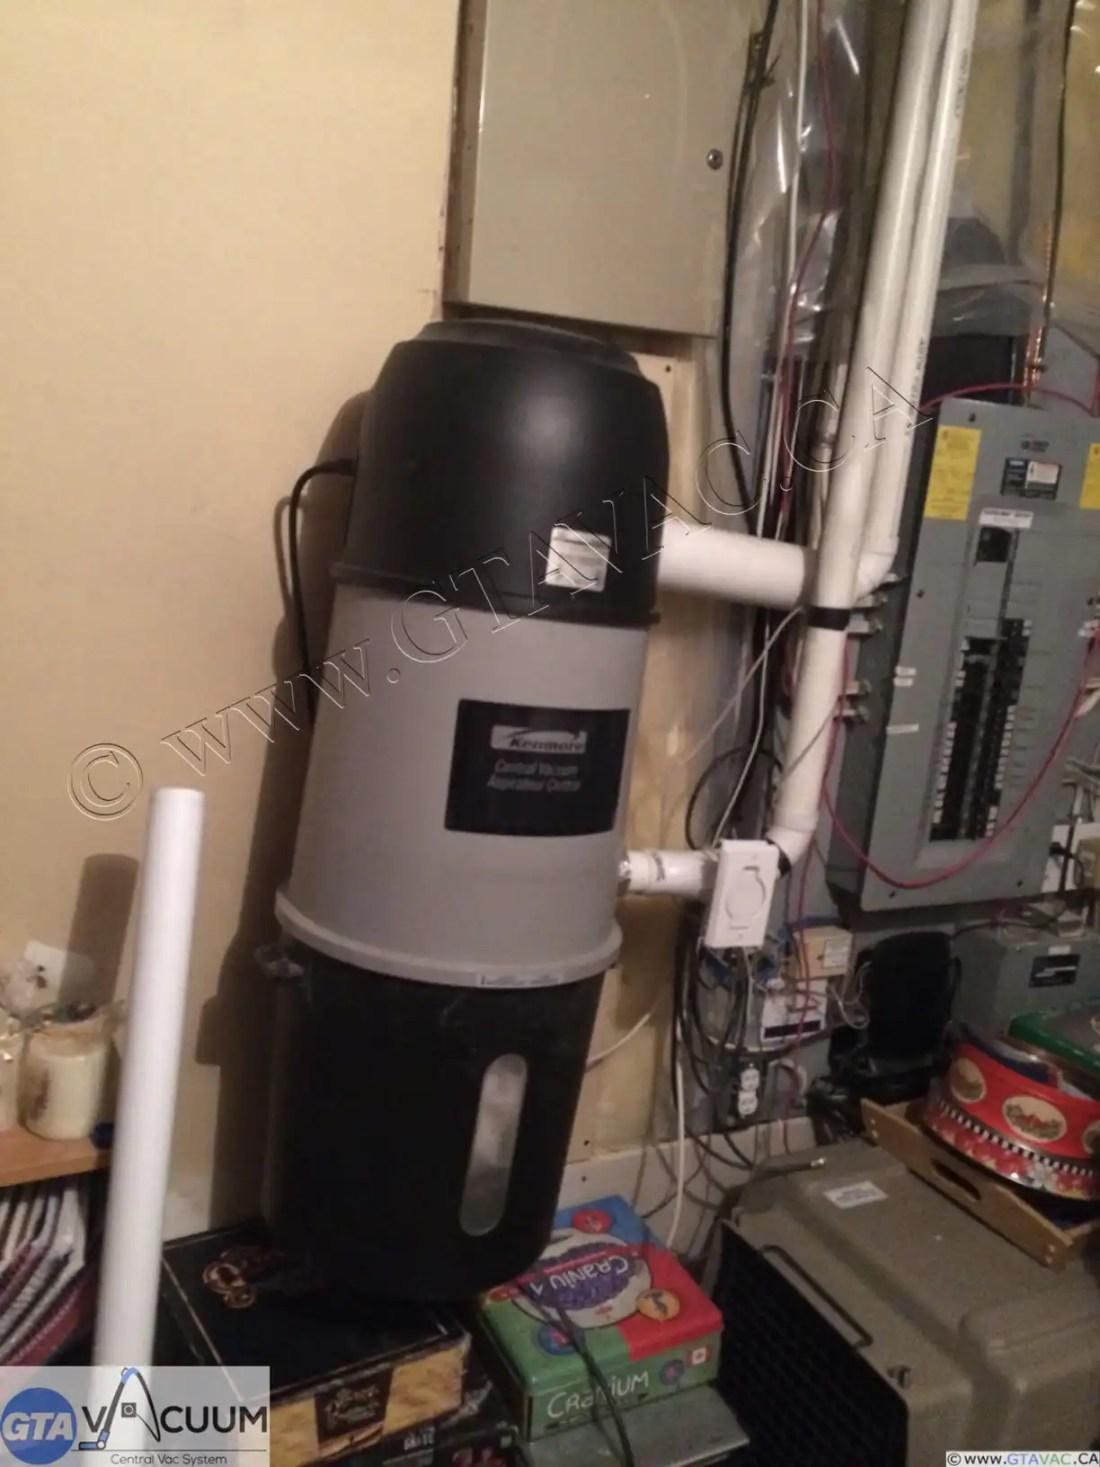 Kenmore Black Central Vacuum GTA Vacuum Recent Project Gallery 1